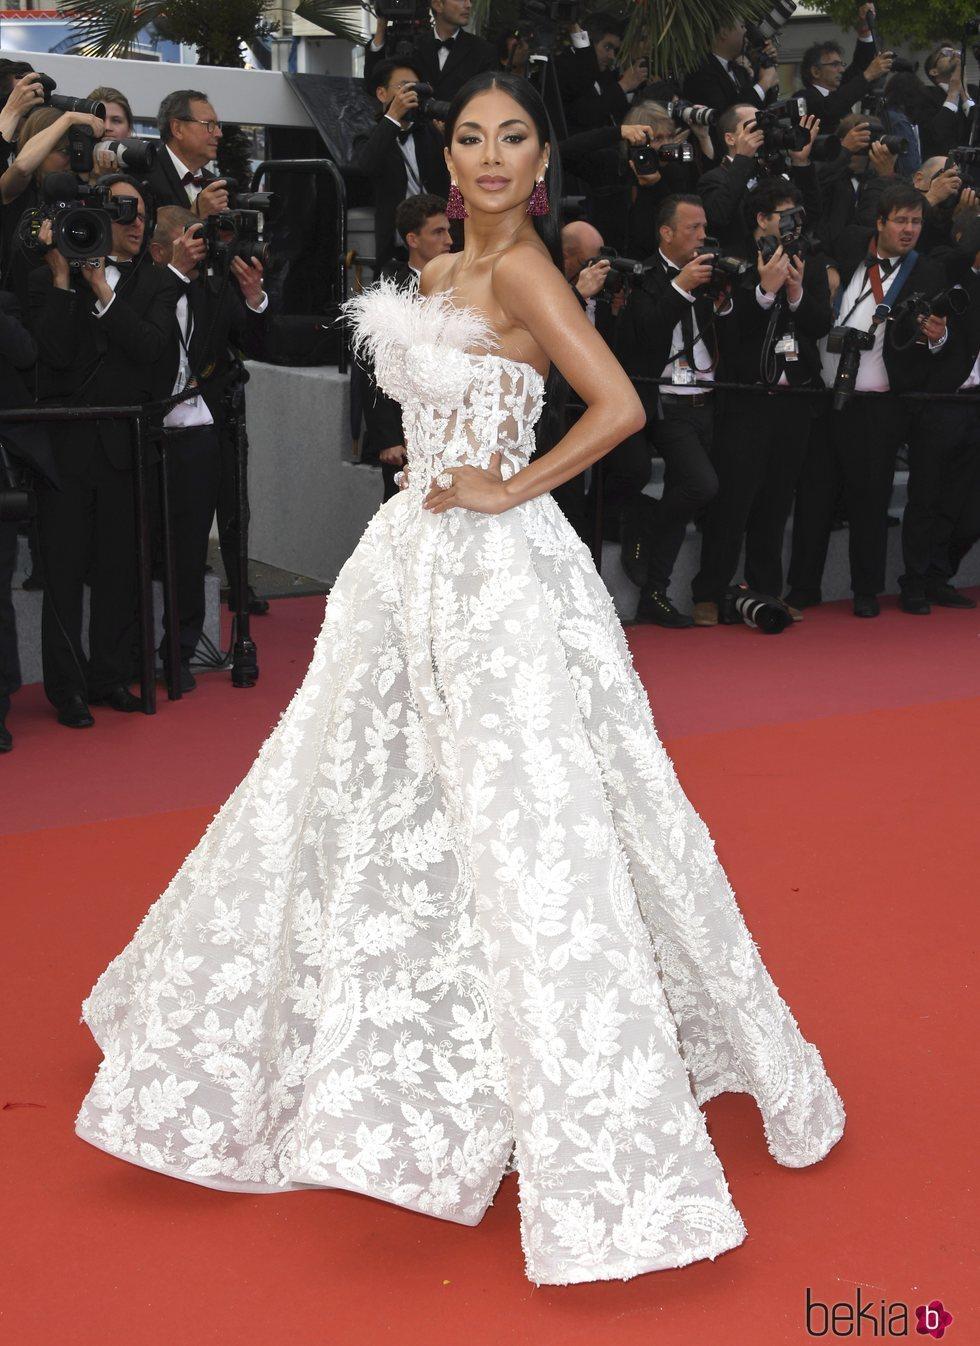 Nicole Scherzinger en la alfombra roja de la película 'BlacKkKlansman' en el Festival de Cannes de 2018